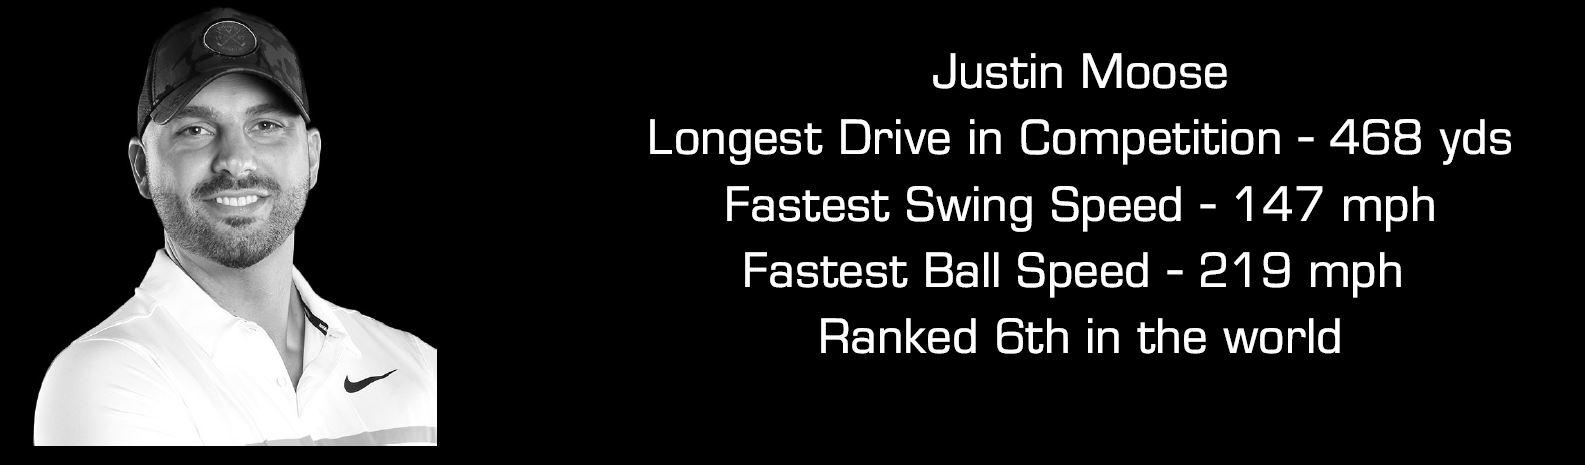 2019 Long Drive Champ Justin Moose